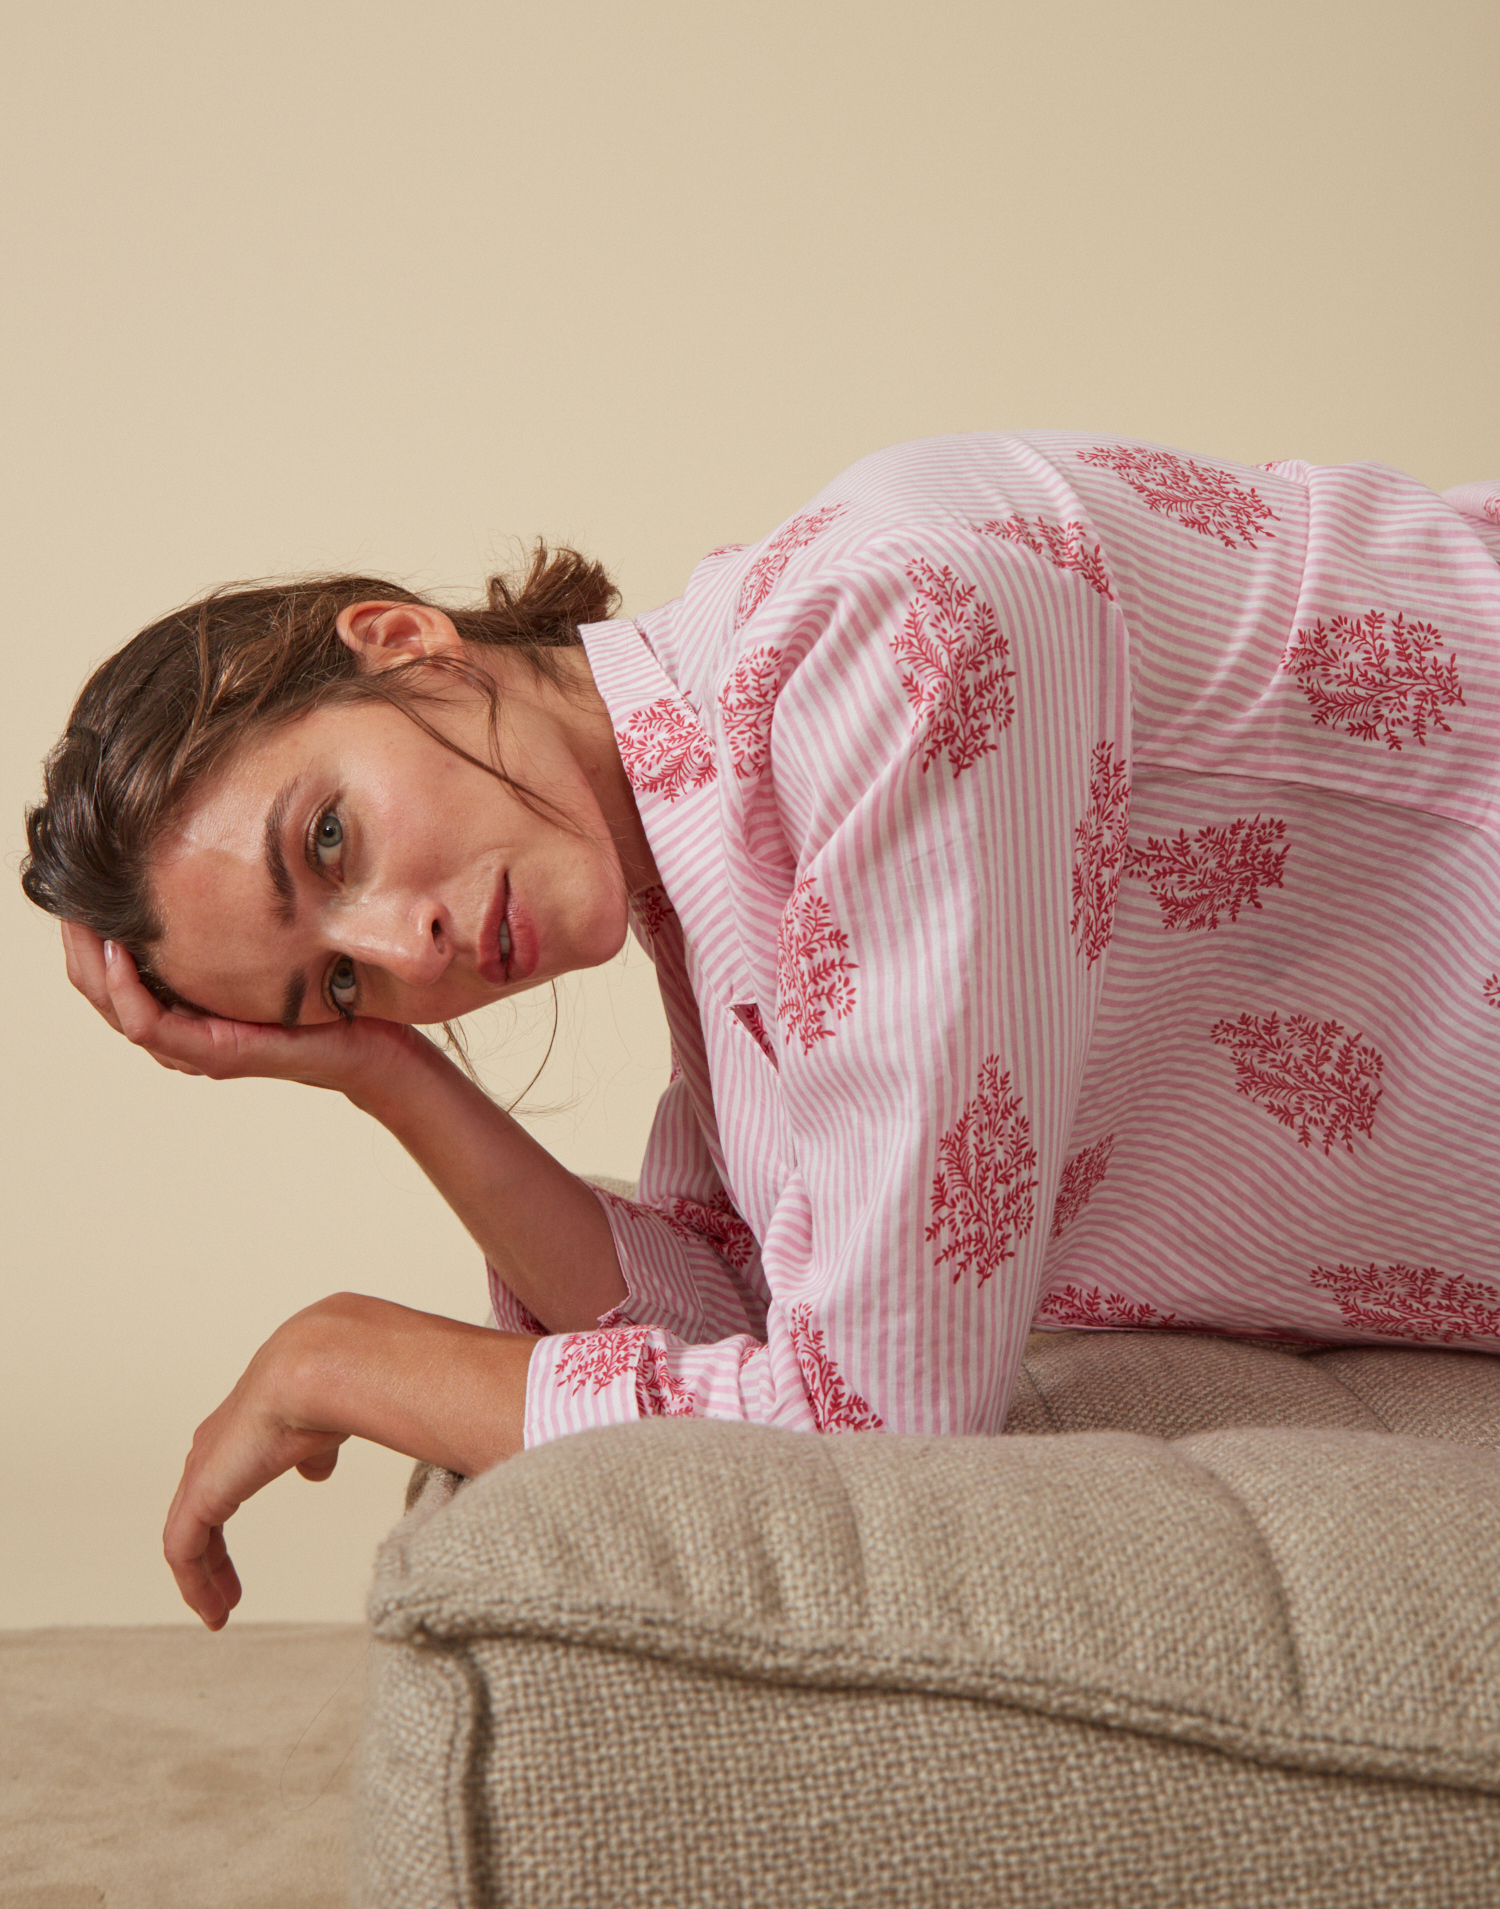 Pijama print rayas y sello con bolsa